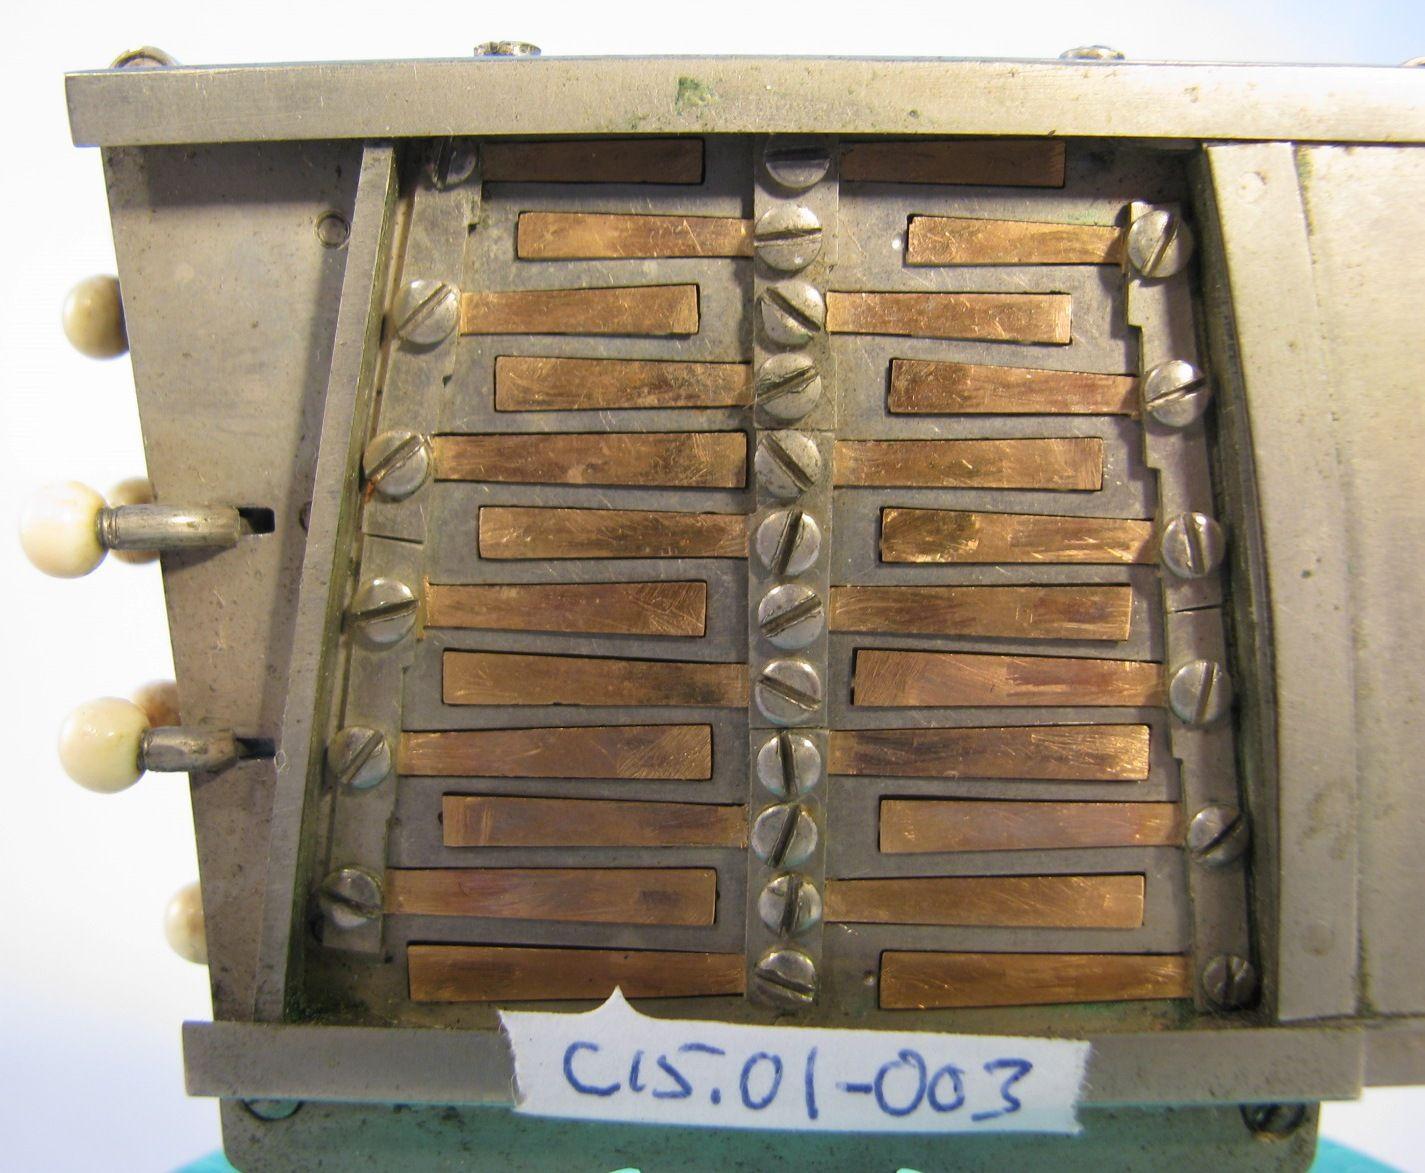 http://www.concertinamuseum.com/Images/C15/C15001-003g1a.jpg